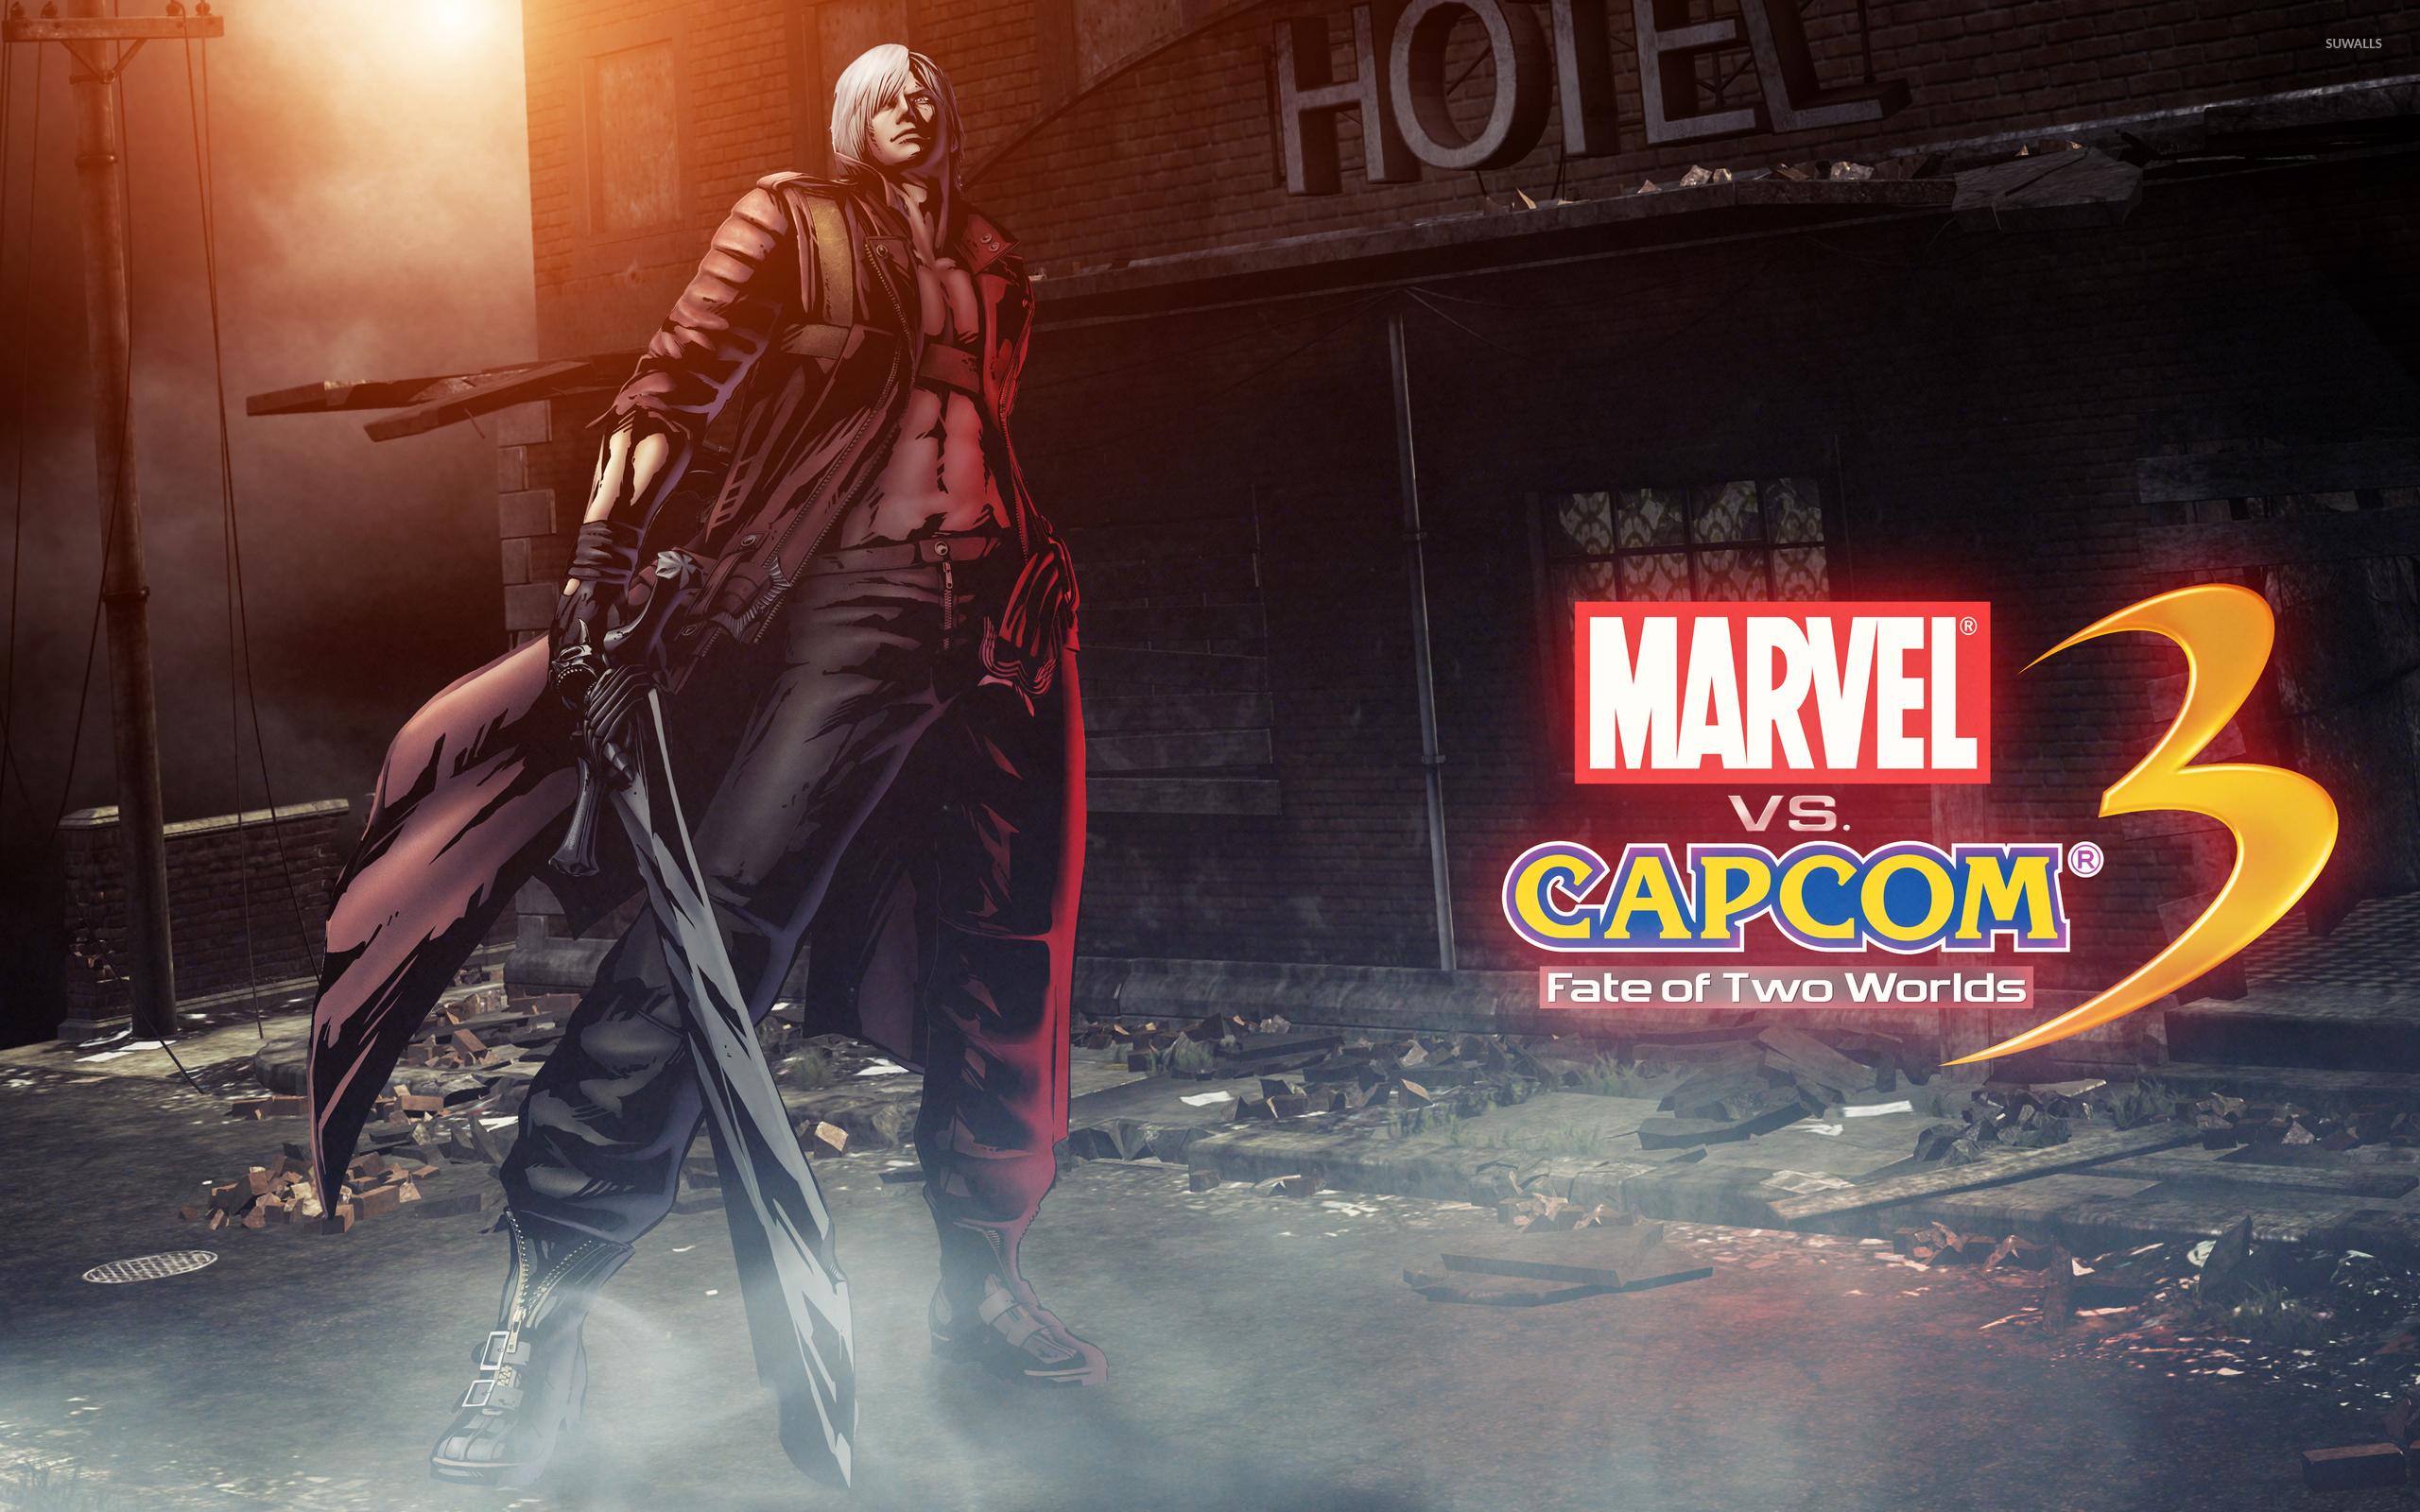 Marvel Vs Capcom 3 Dante Wallpaper Game Wallpapers 2710